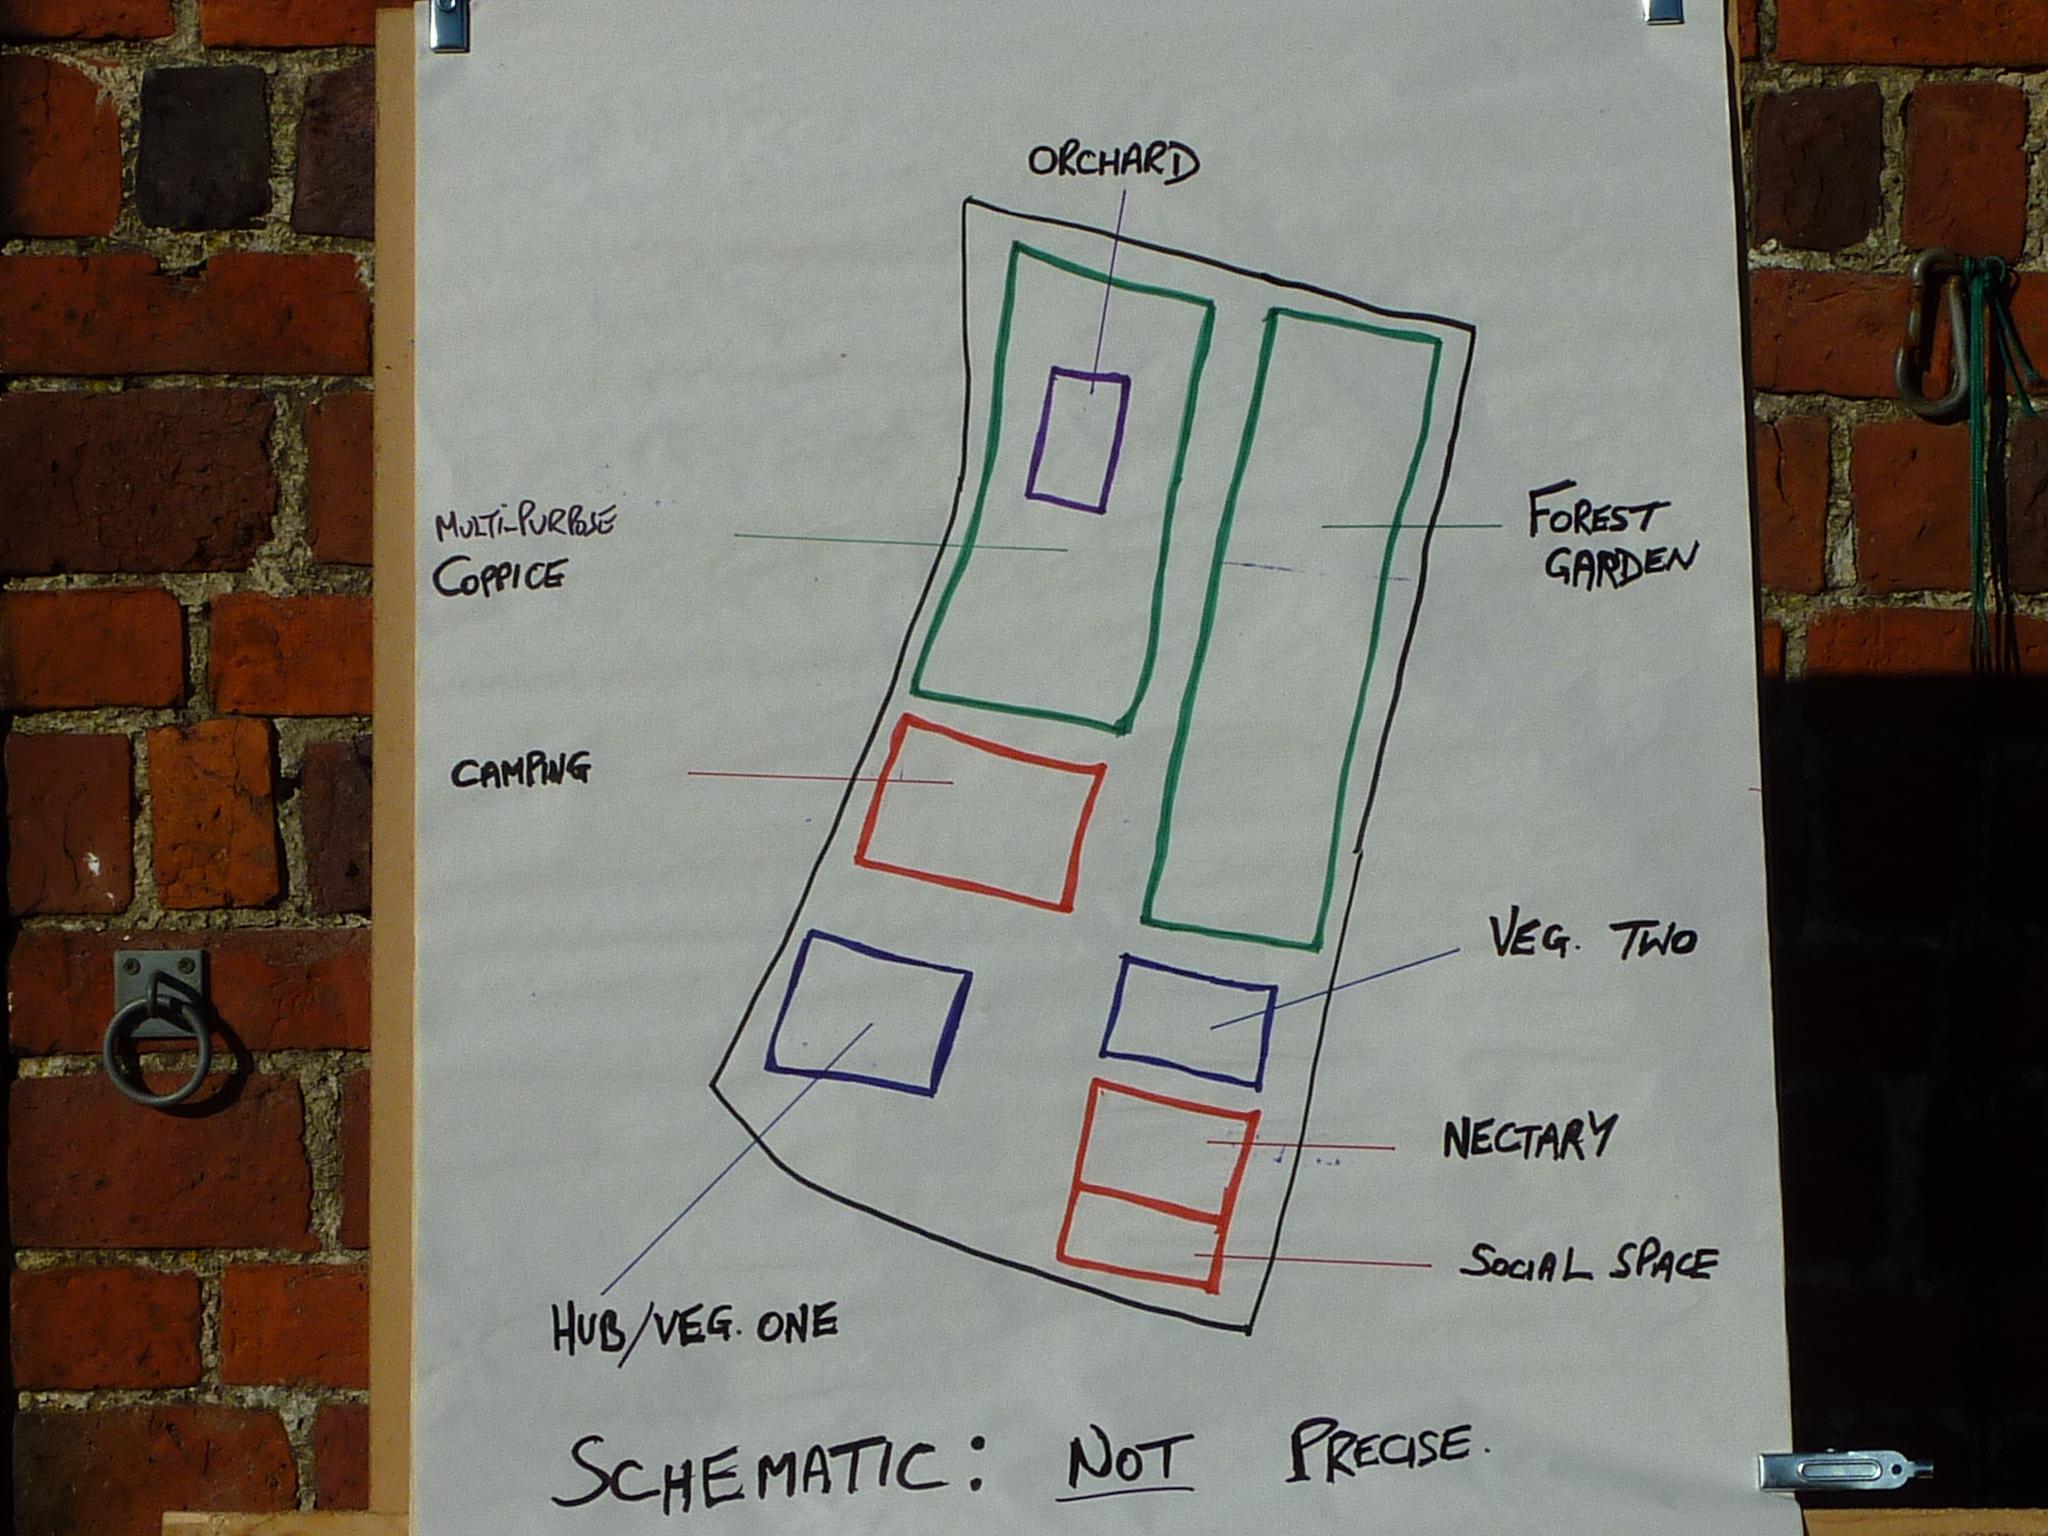 Permaculture design schematic